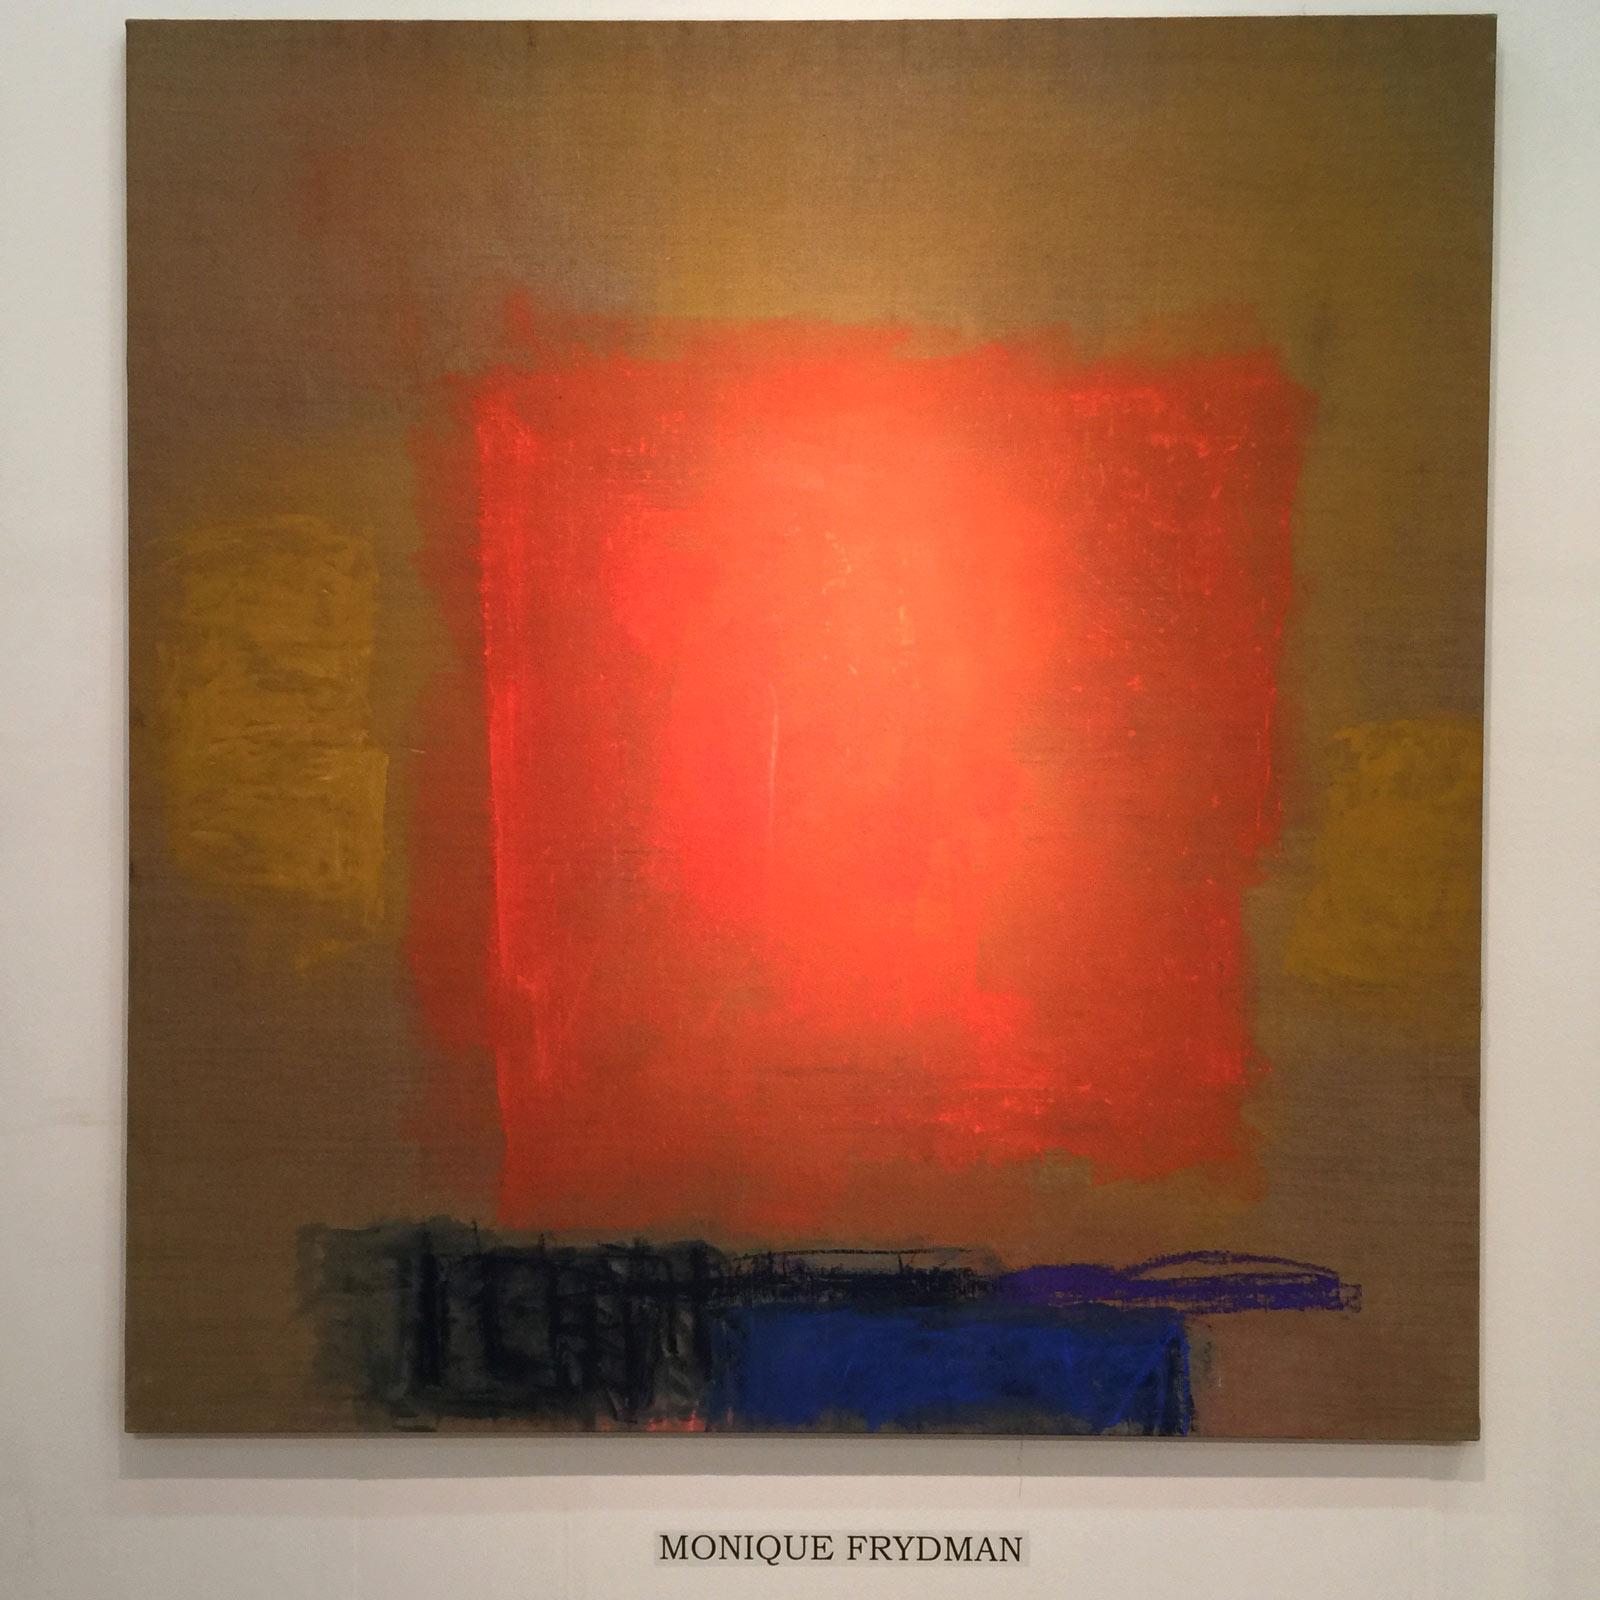 Monique-Frydman-Senates-12-Boccara-Art-Gallery.jpg